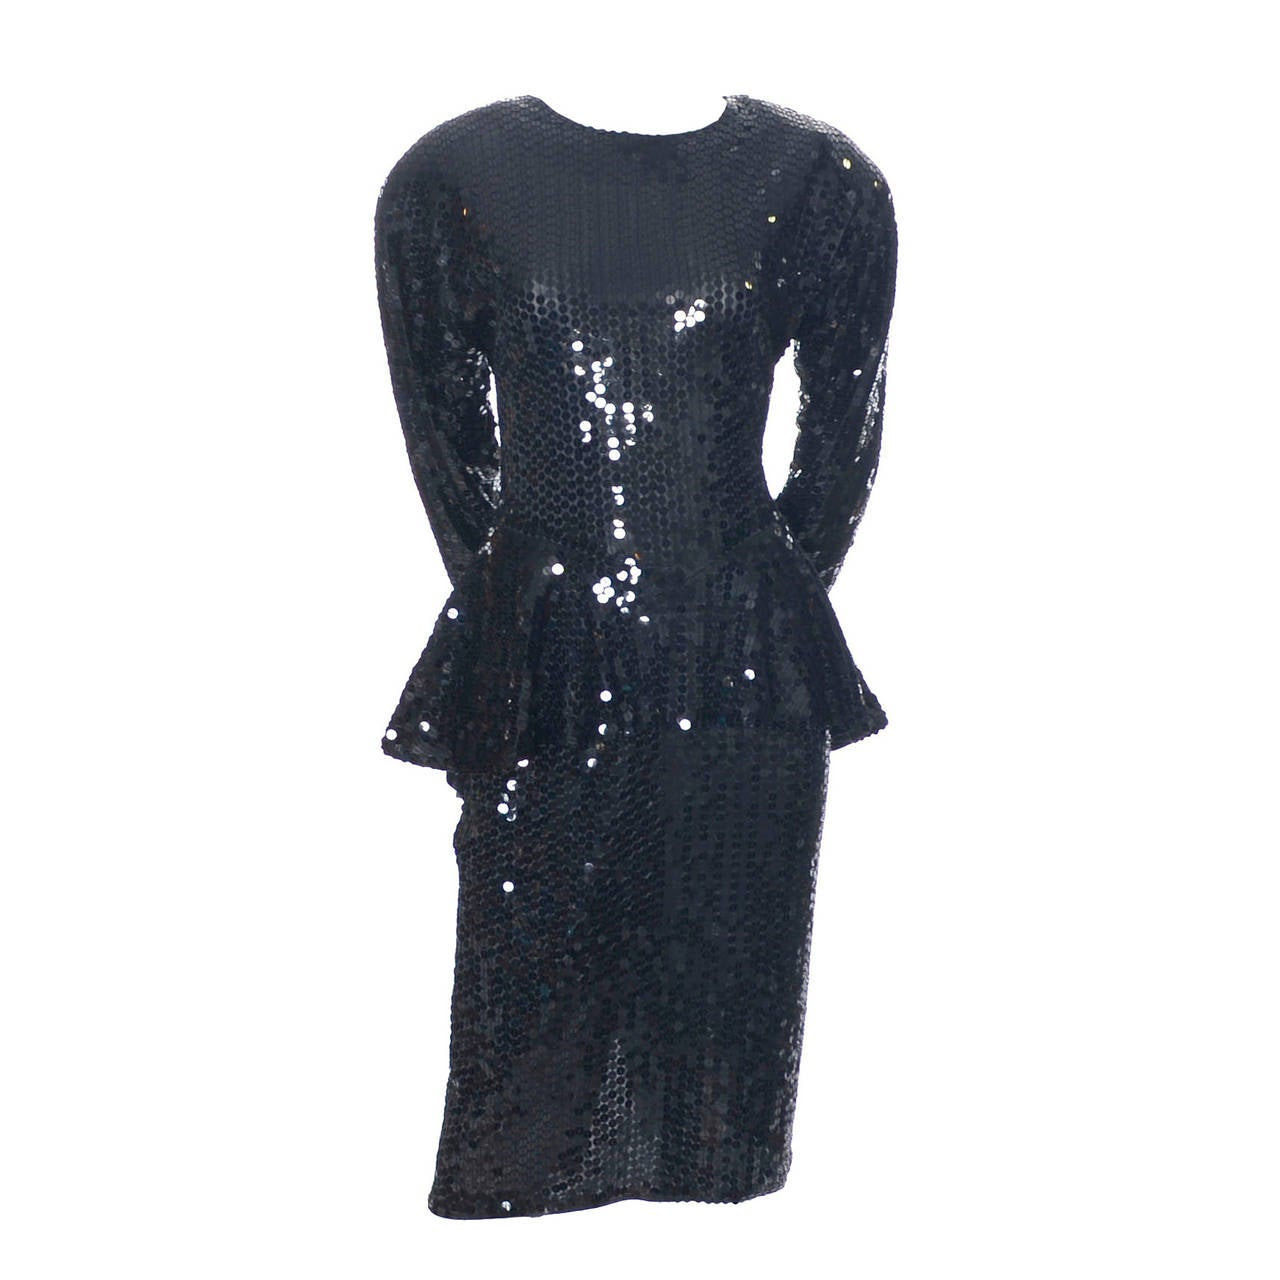 Oleg Cassini Vintage Dress Black Sequins Peplum 1980s Evening For ...